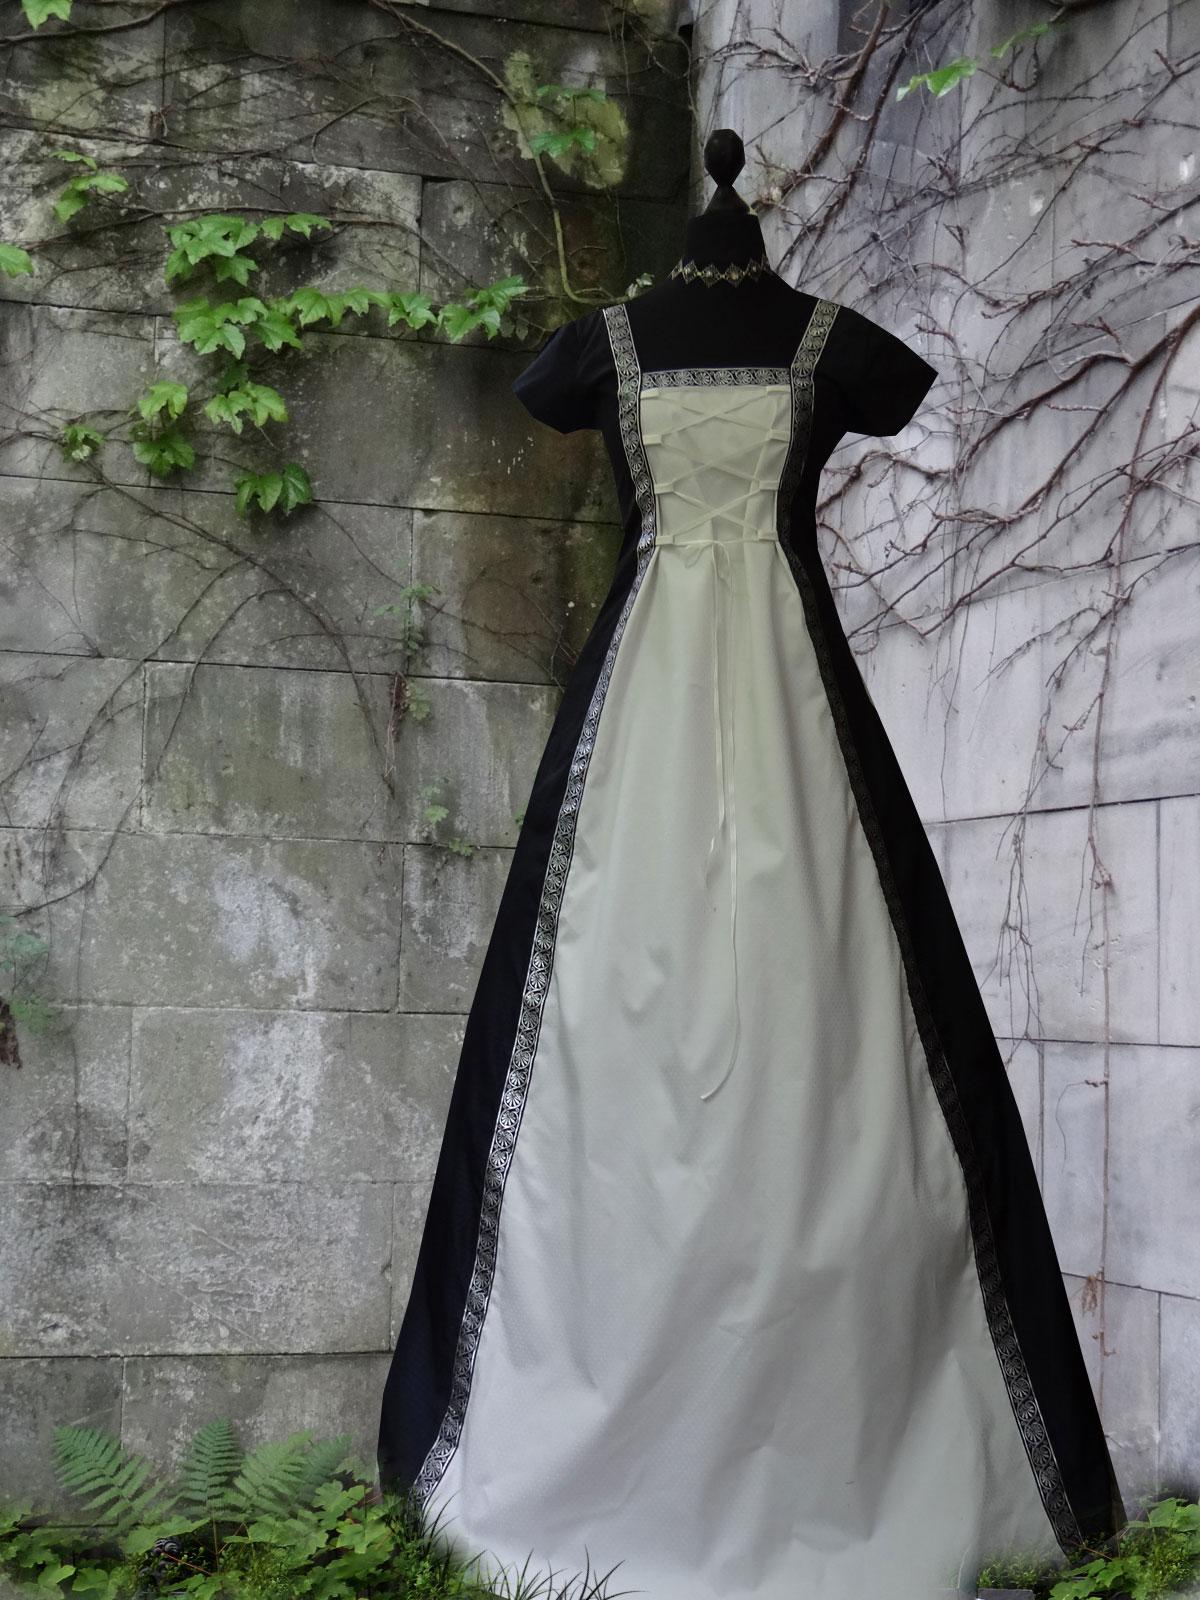 Sommer Mittelalterkleid blau weiß Mittelalterborte ärmellos Medieval Dress